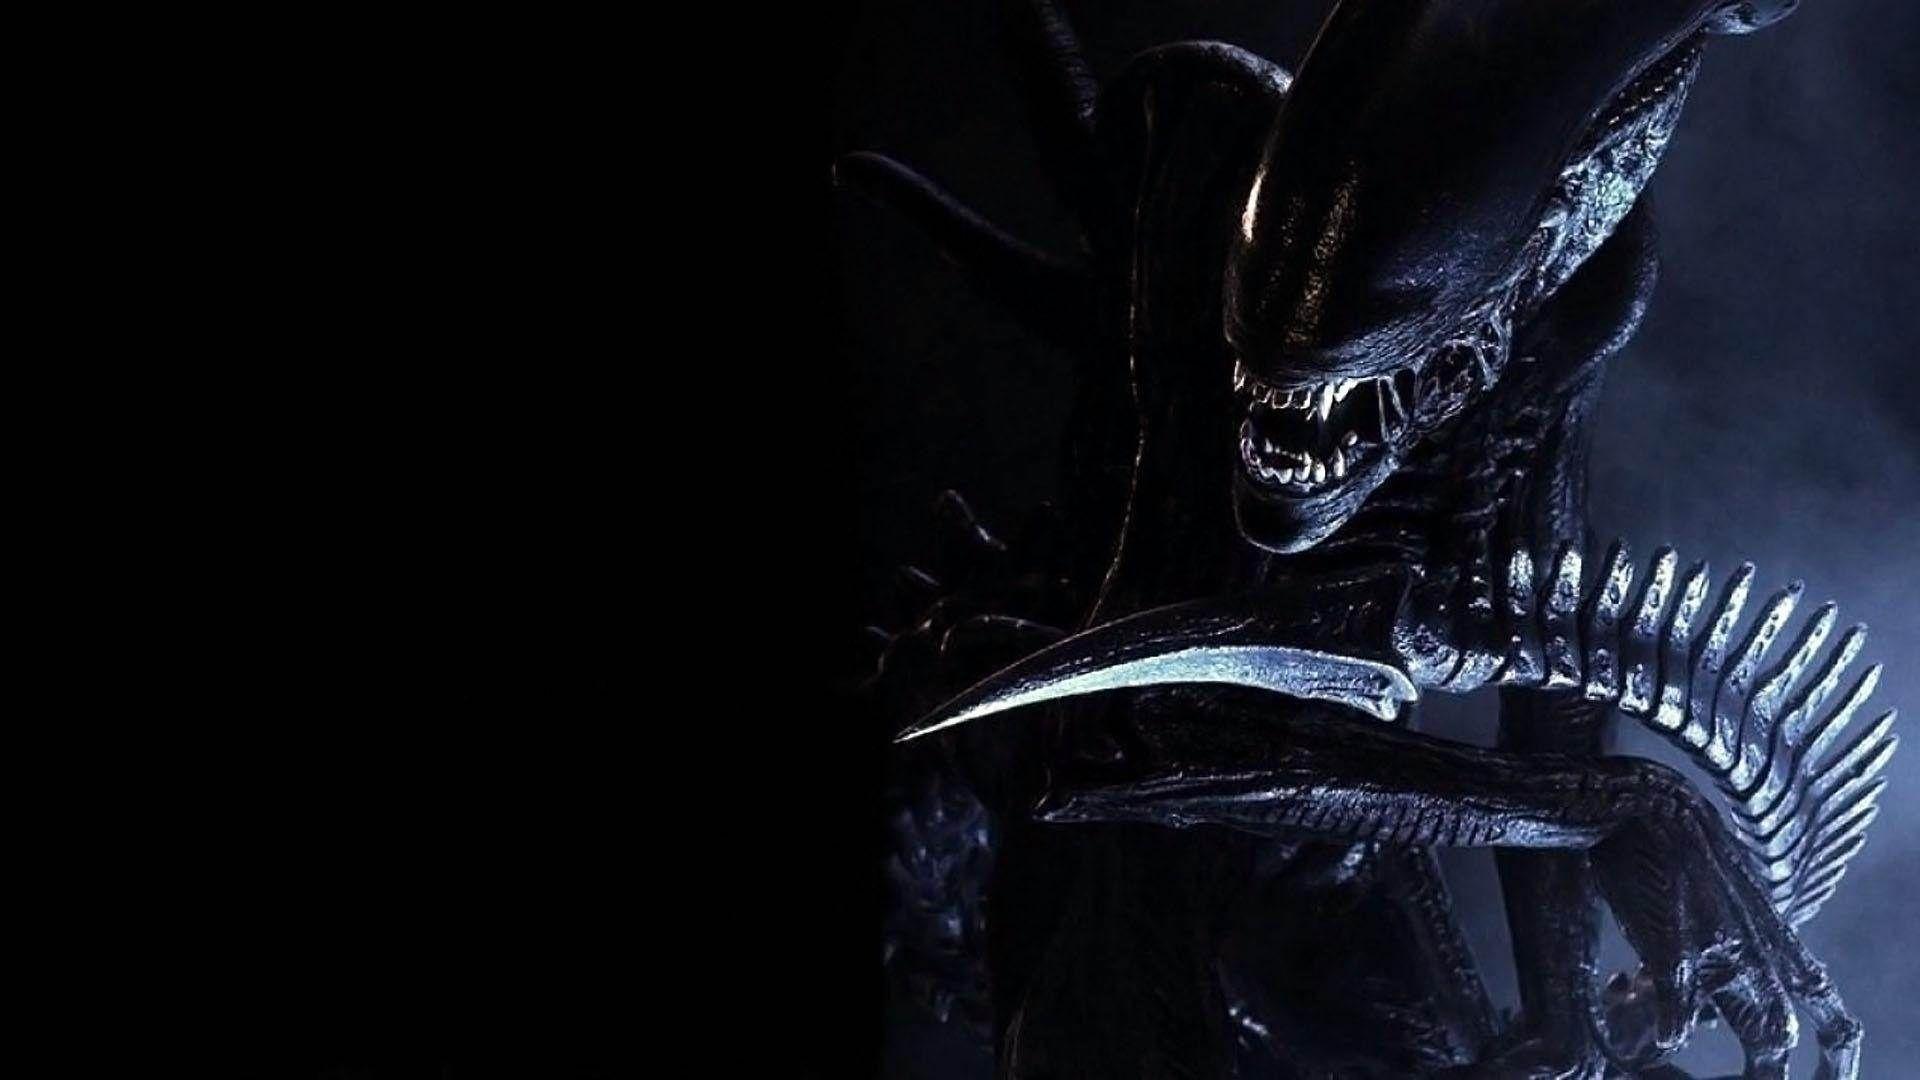 Alien Vs Predator Hd Wallpapers: Download Amazing Predator Alien Vs Theme Top Windows